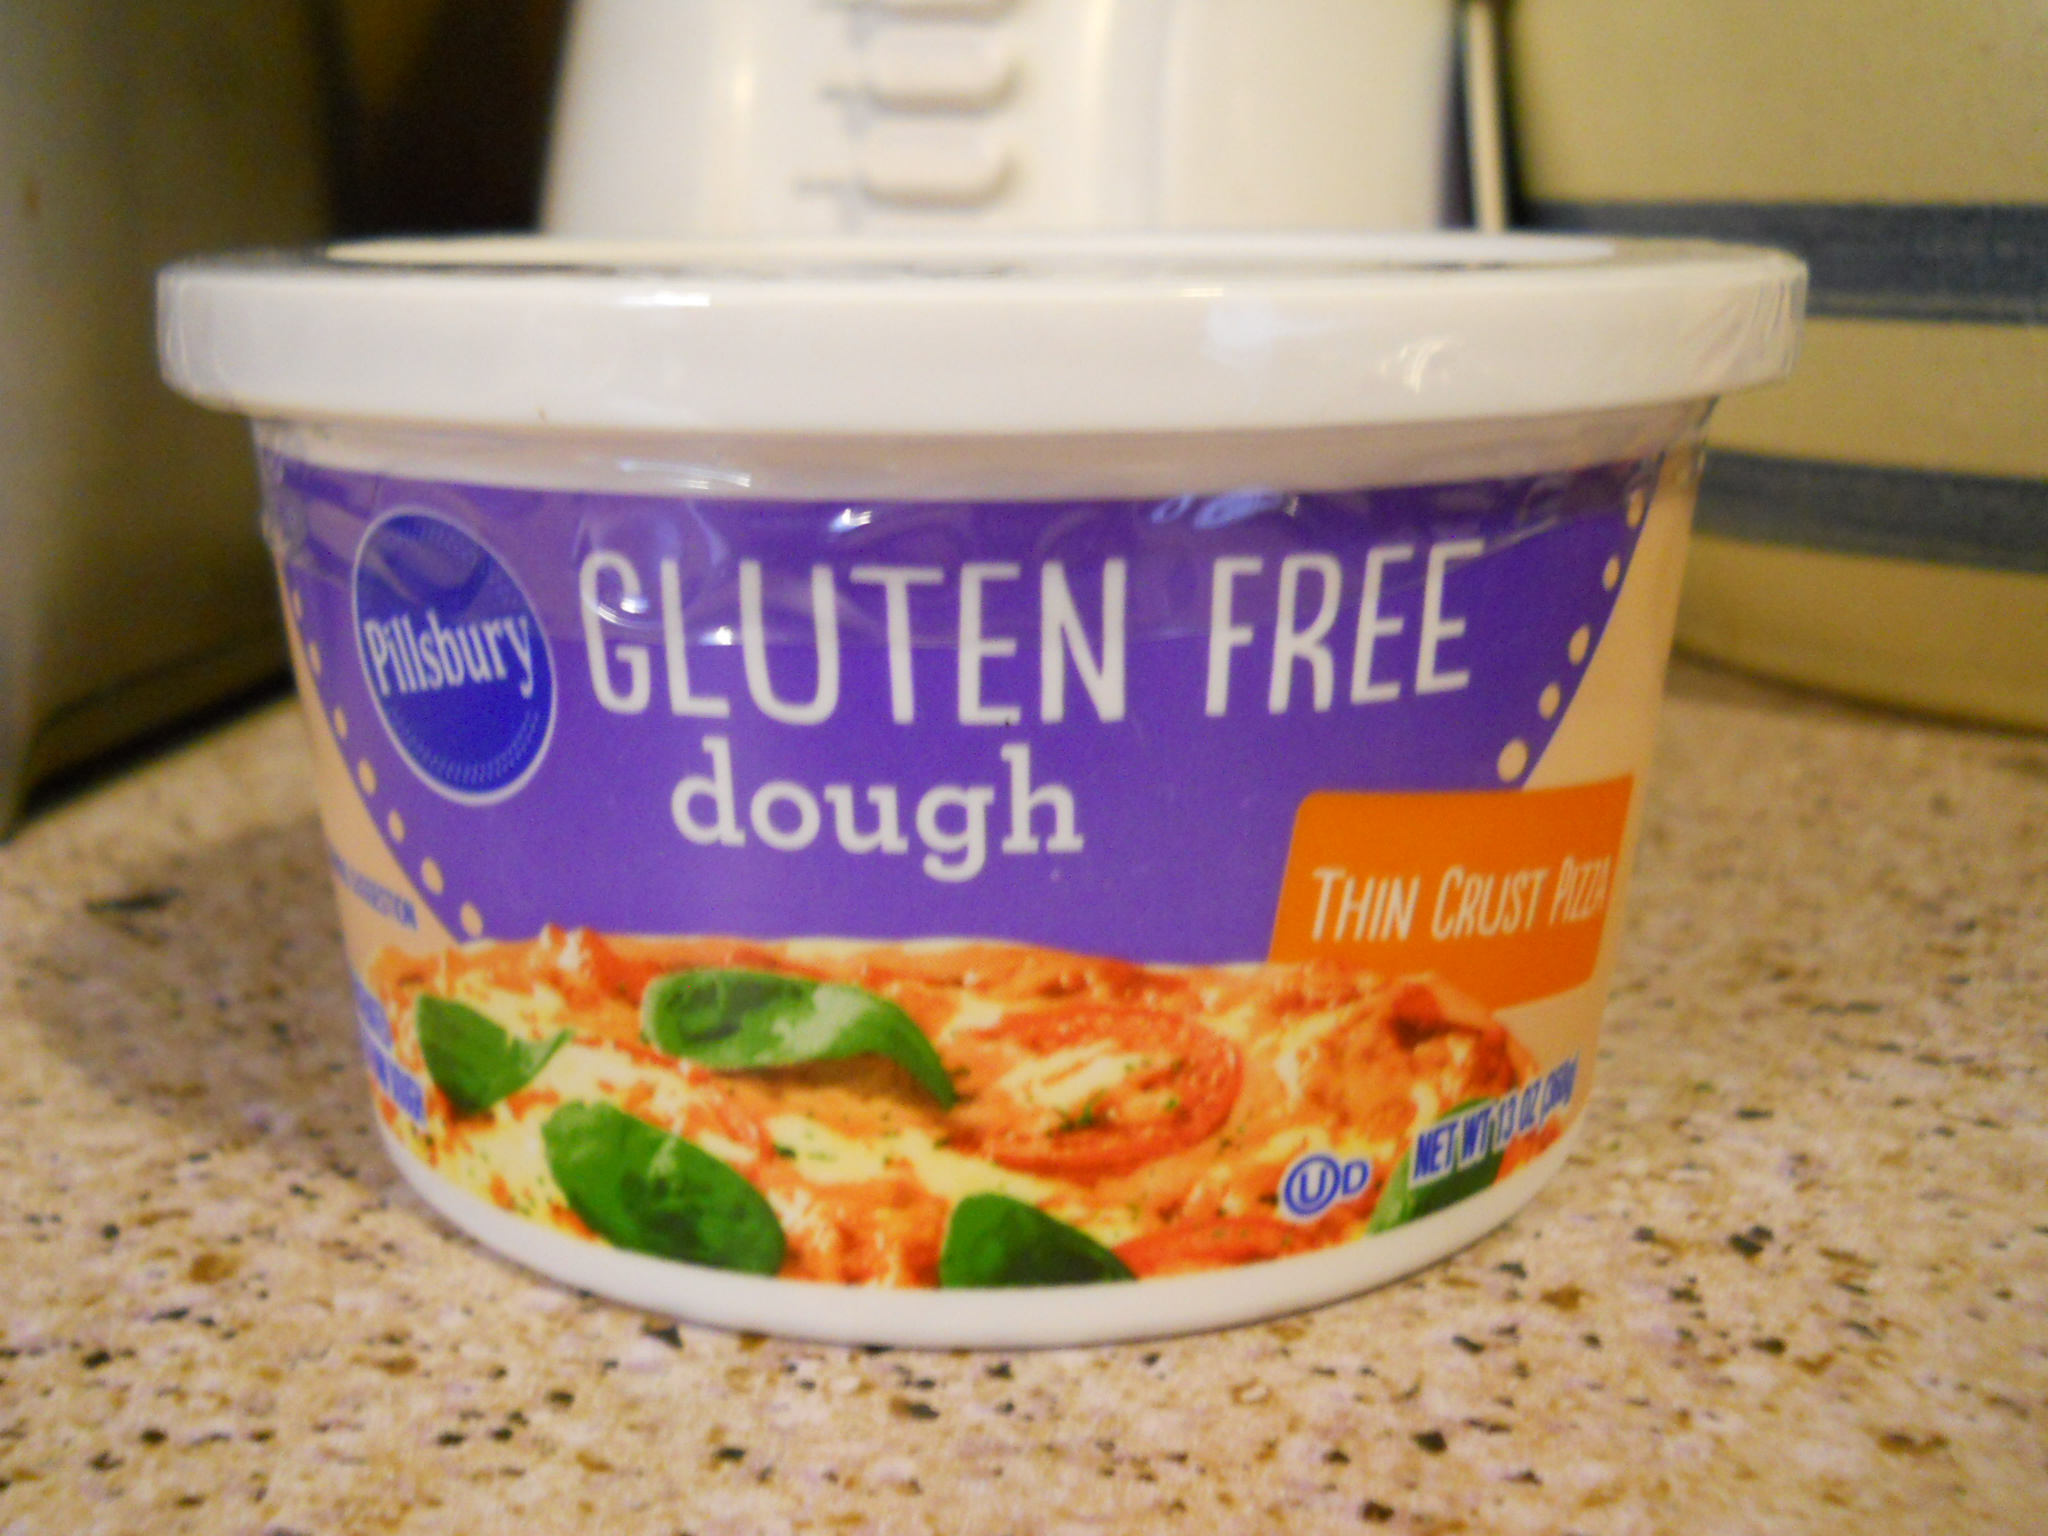 pillsbury refrigerated gluten free pizza crust dough